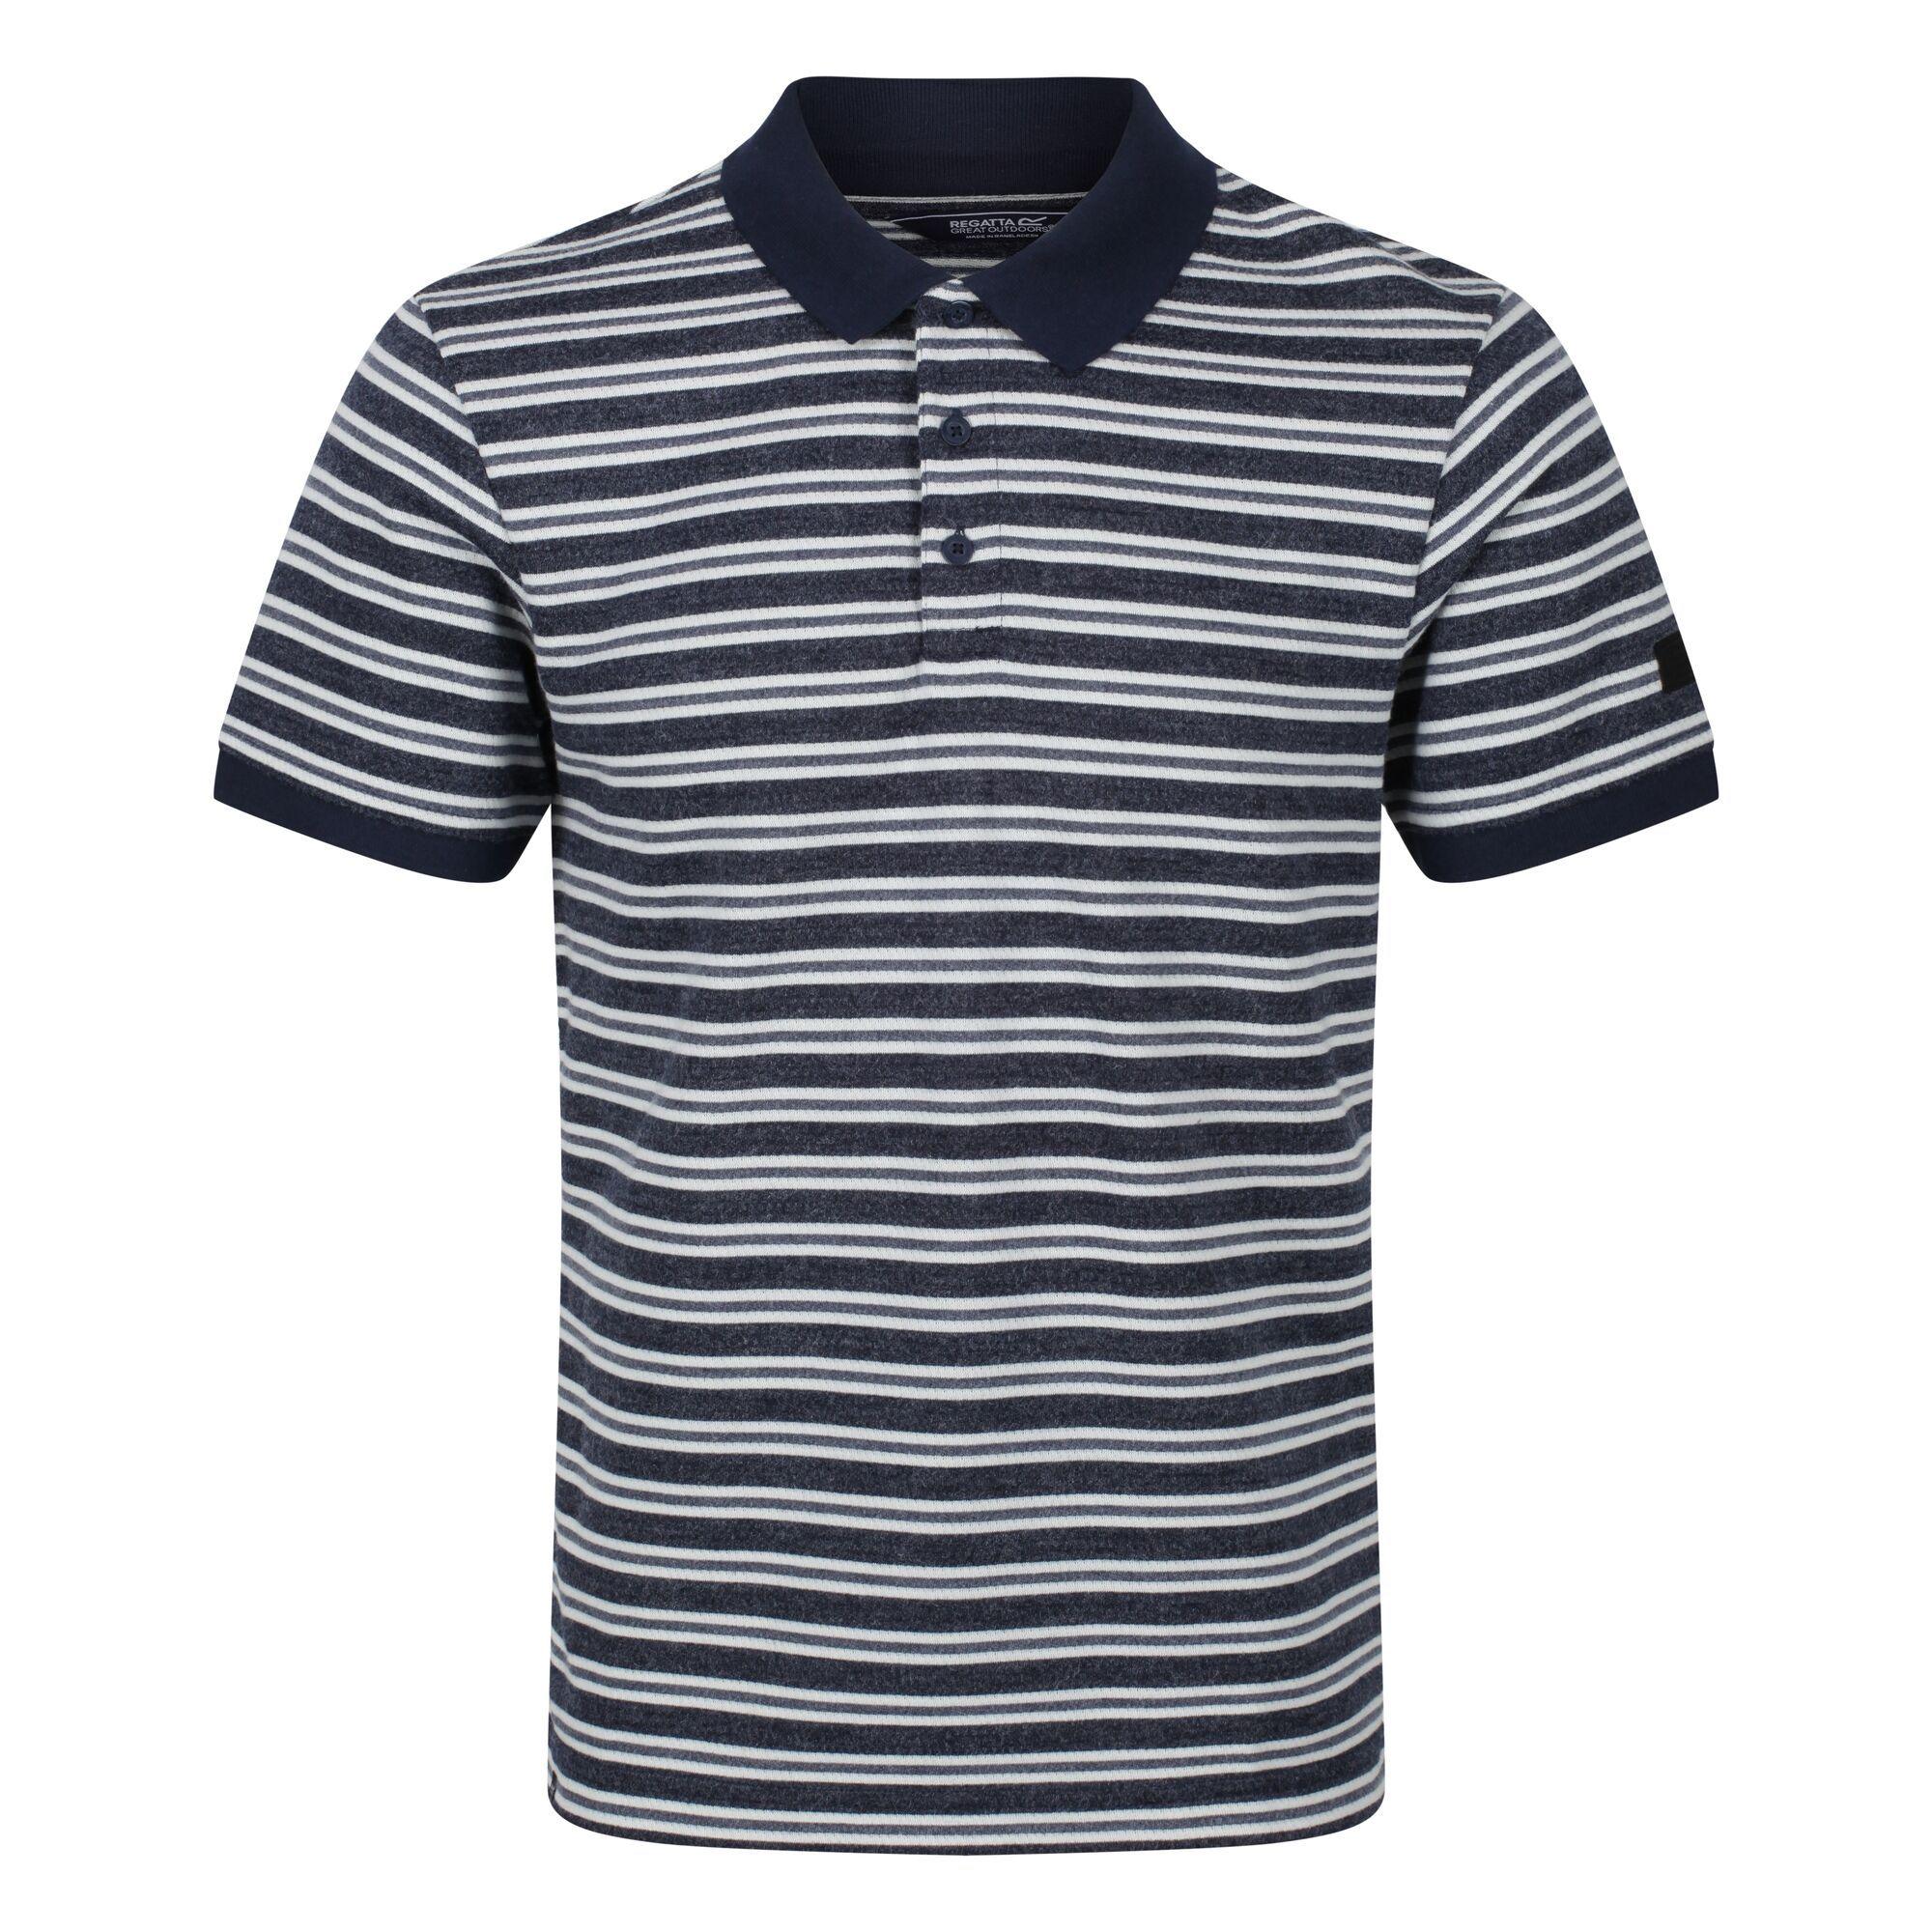 Regatta Mens Malak Striped Polo Shirt (L) (Navy)